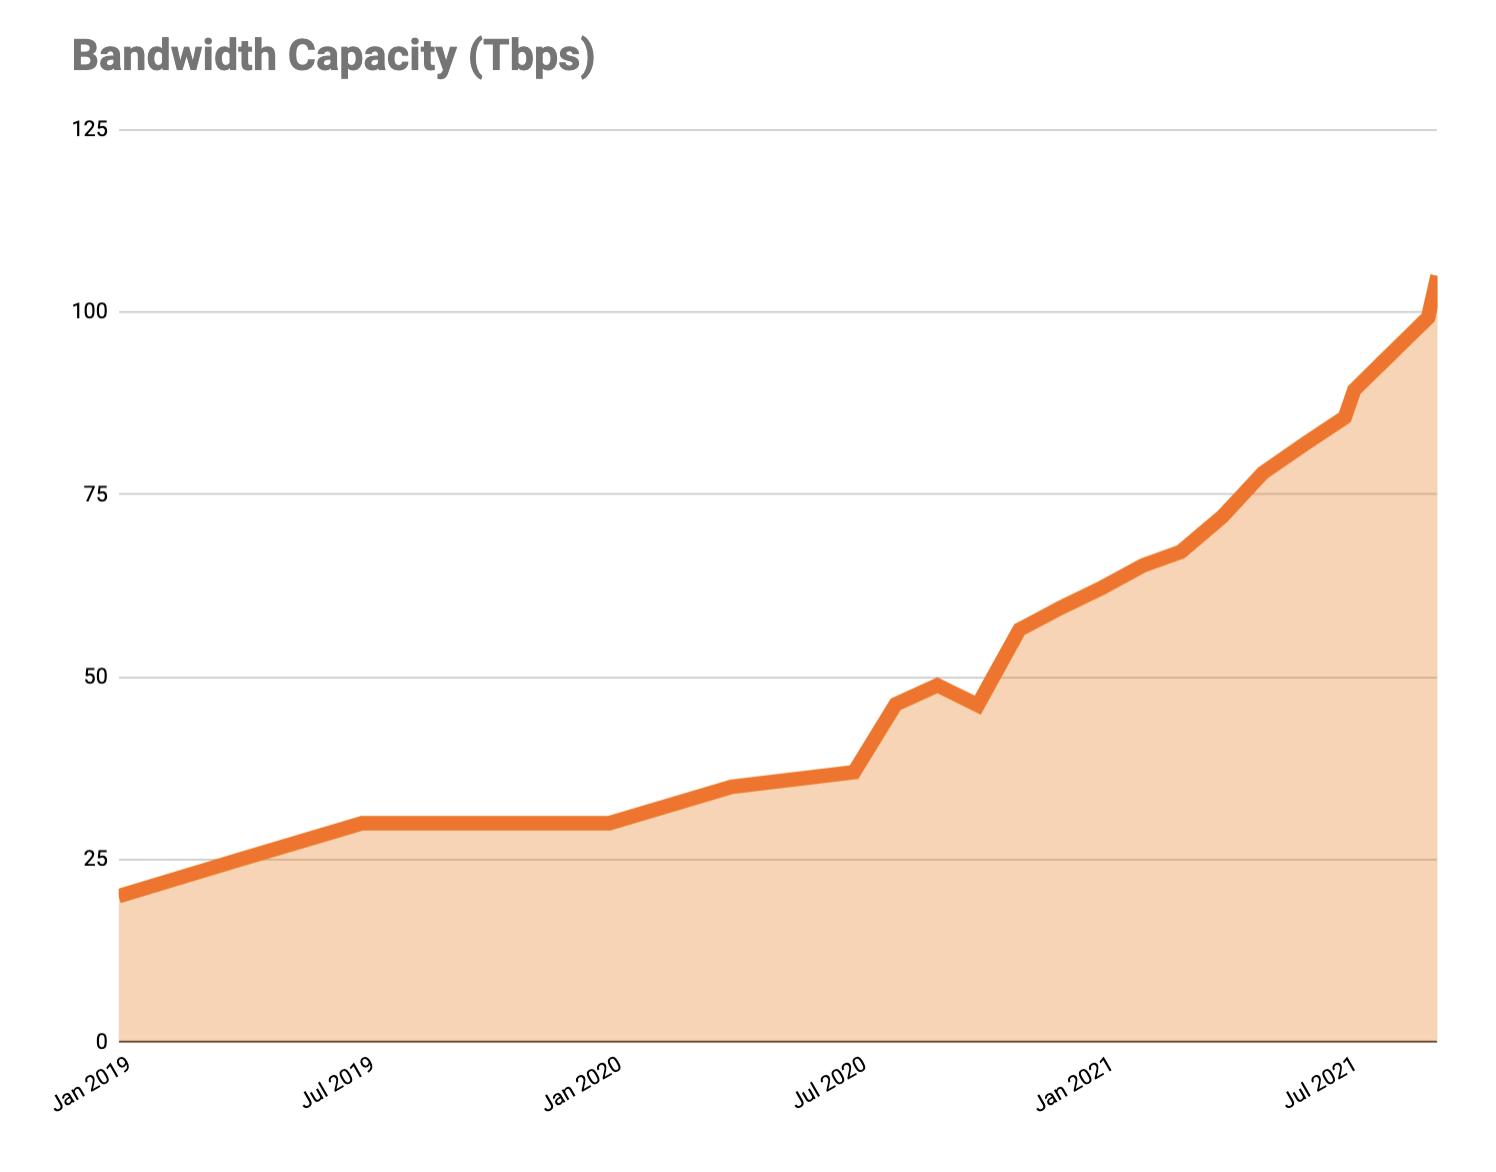 Cloudflare Passes 250 Cities, Triples External Network Capacity, 8x-es Backbone